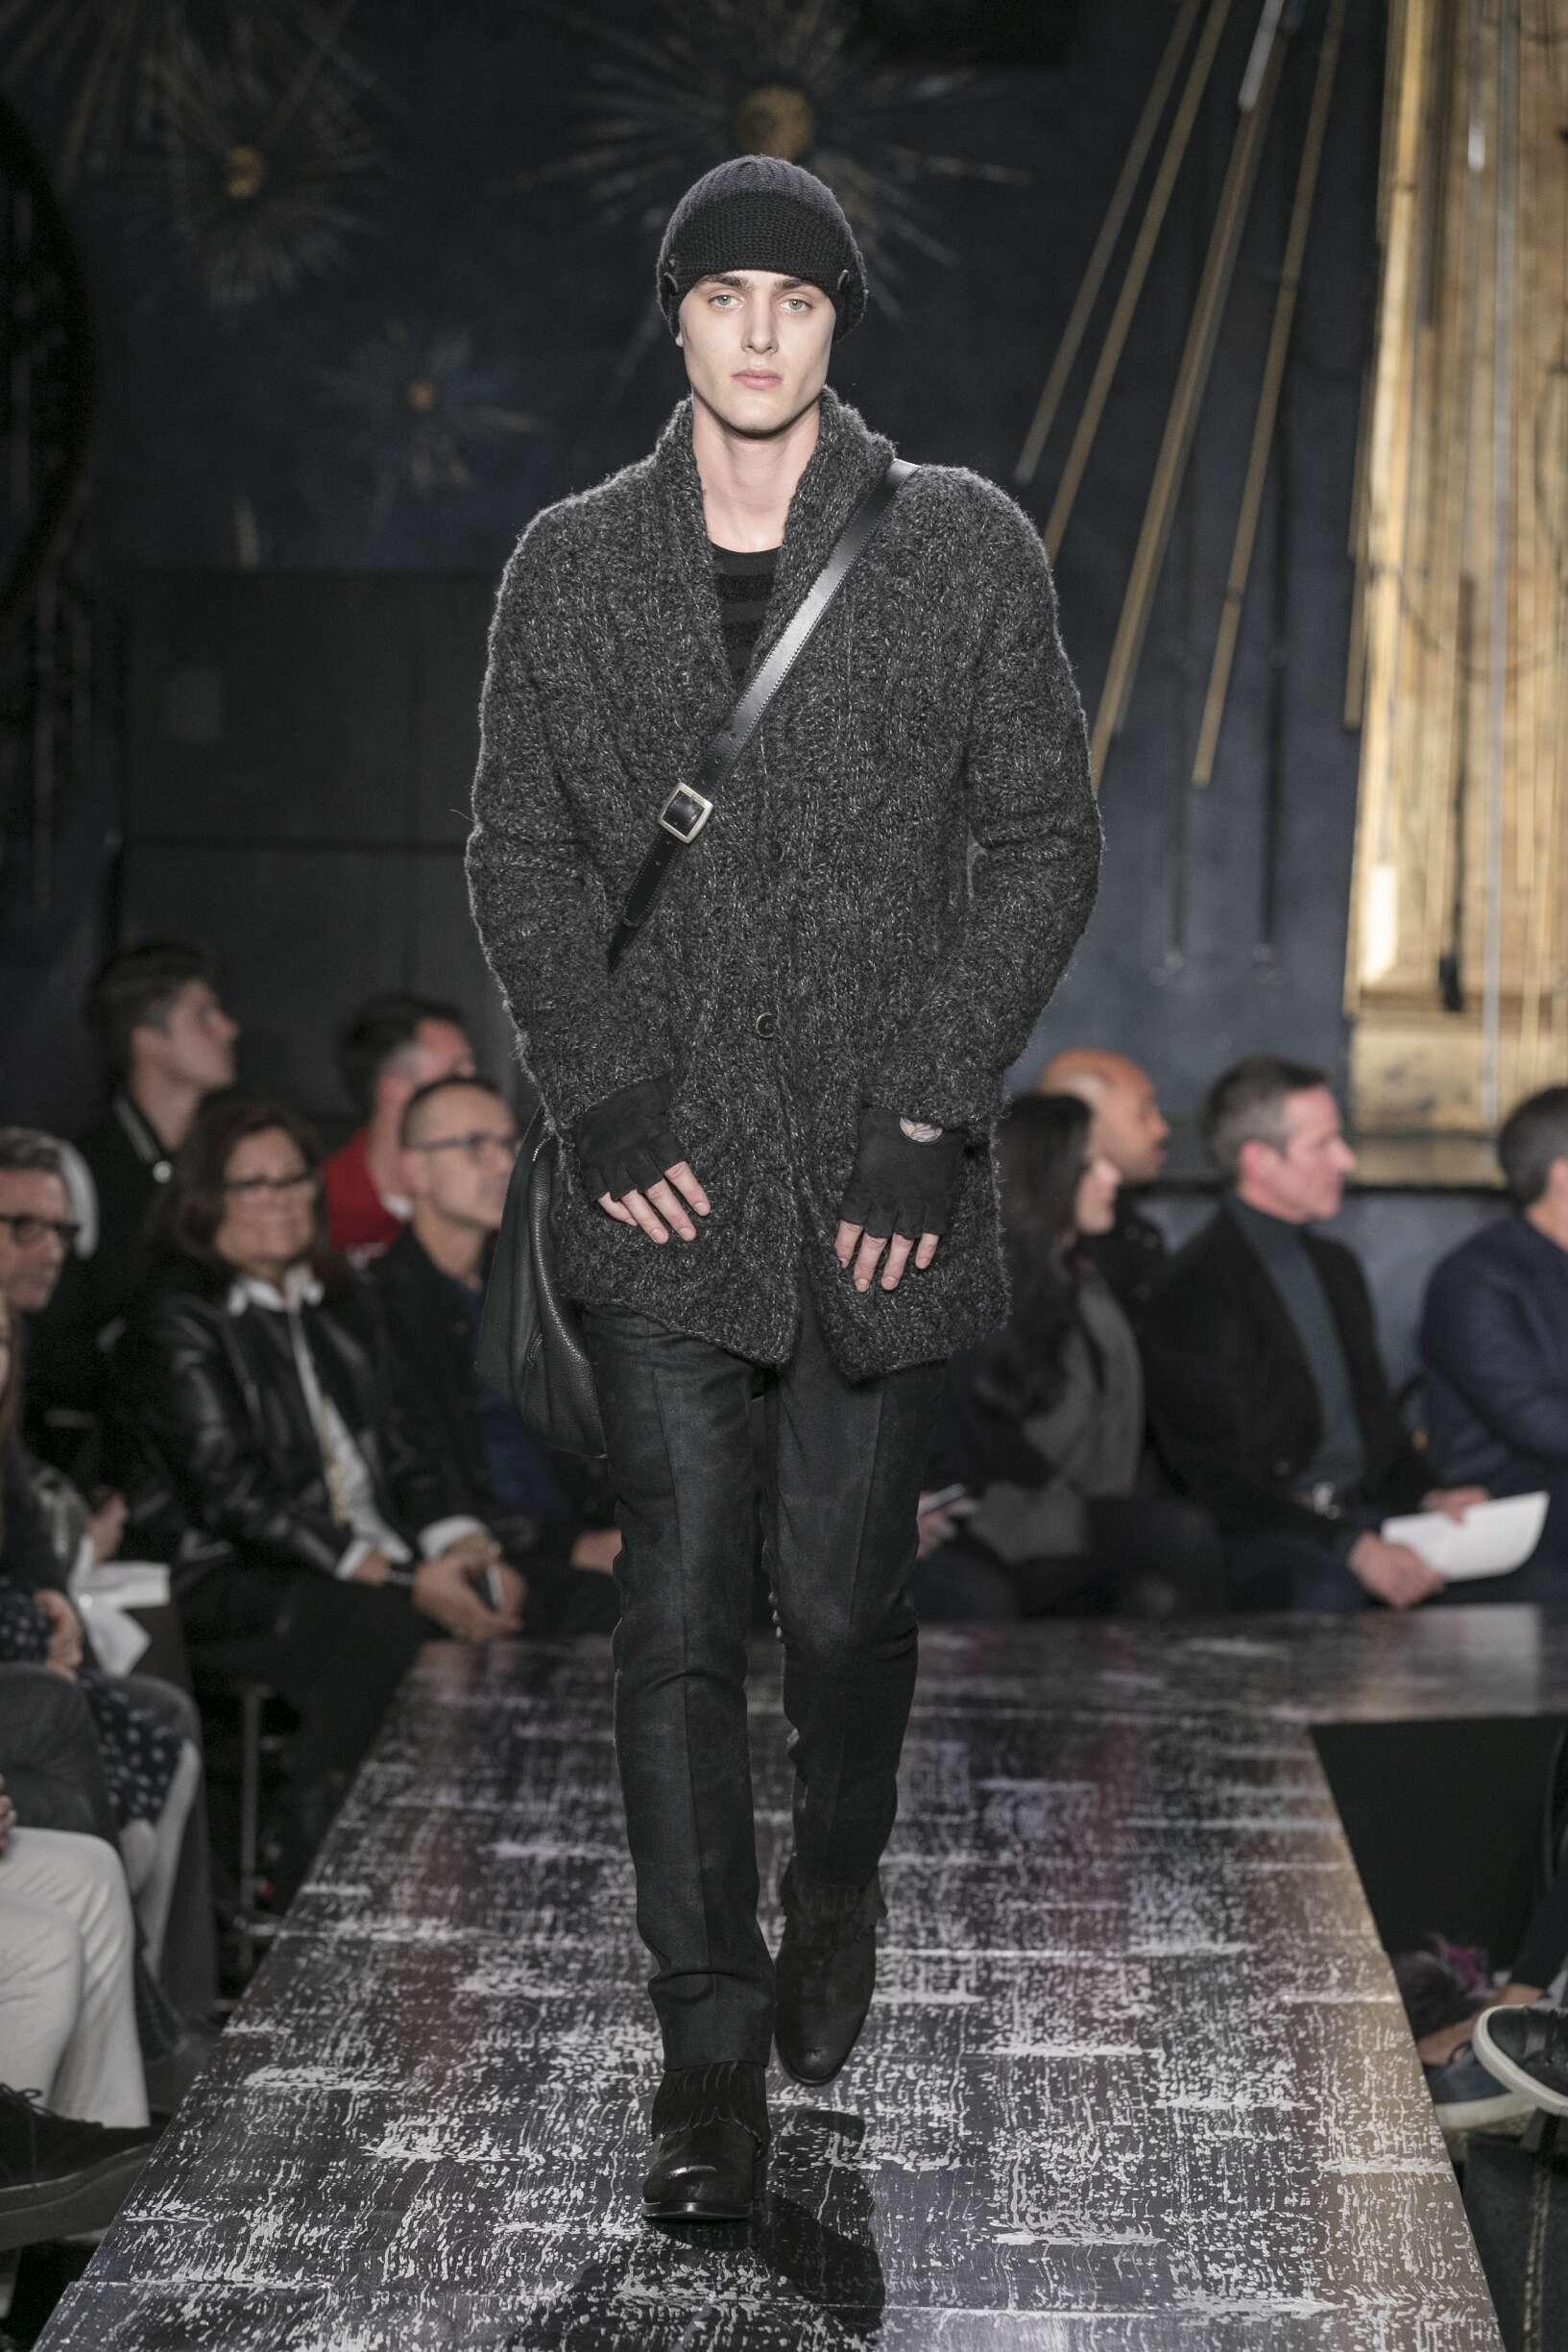 Runway John Varvatos Fall Winter 2017 Men's Collection New York Fashion Week